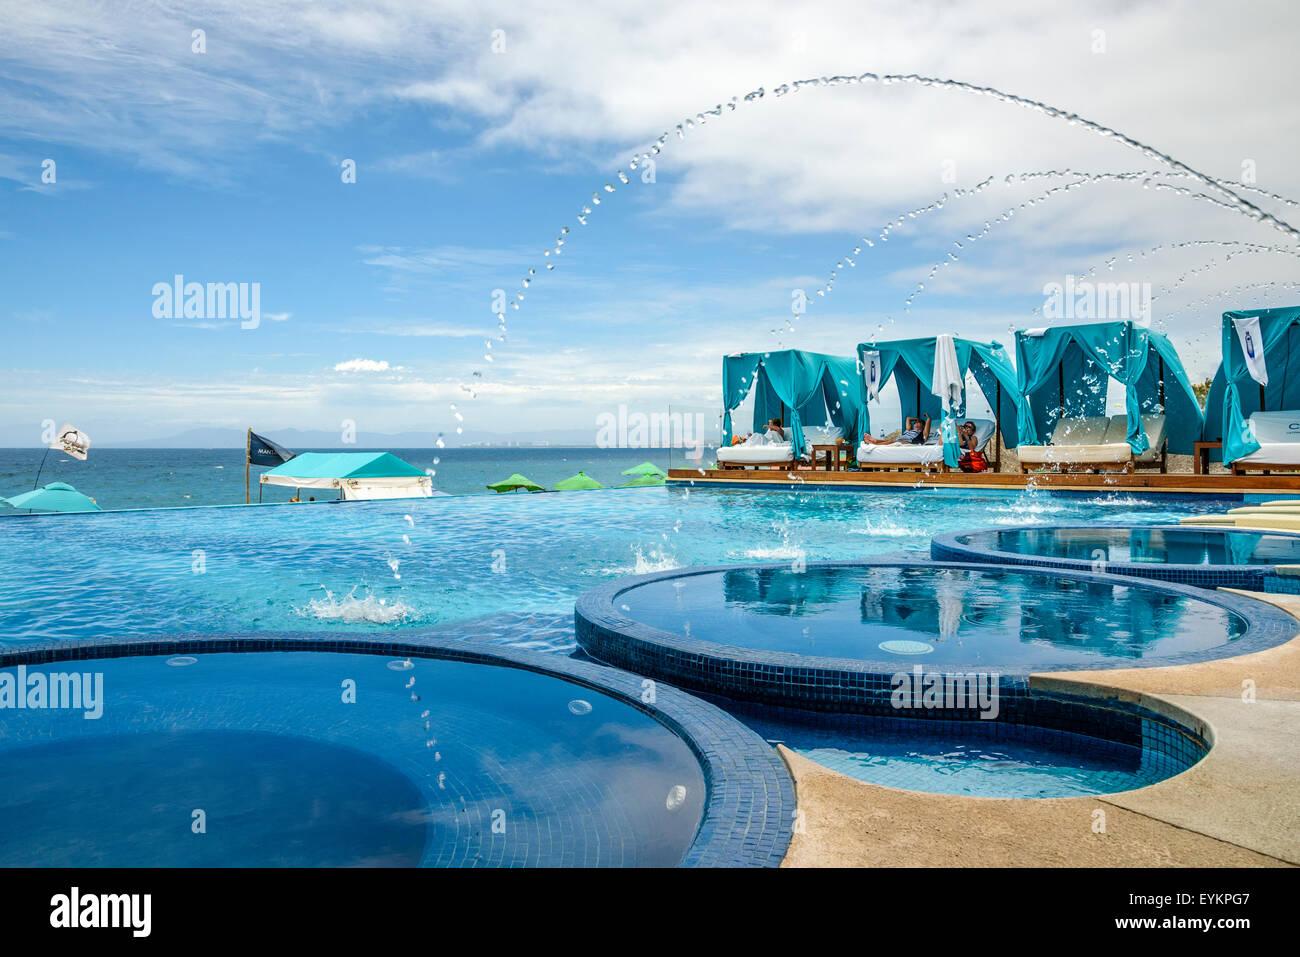 blue chair puerto vallarta. mantanar beach club swimming pool and lounge chairs; puerto vallarta, jalisco, mexico. blue chair vallarta e